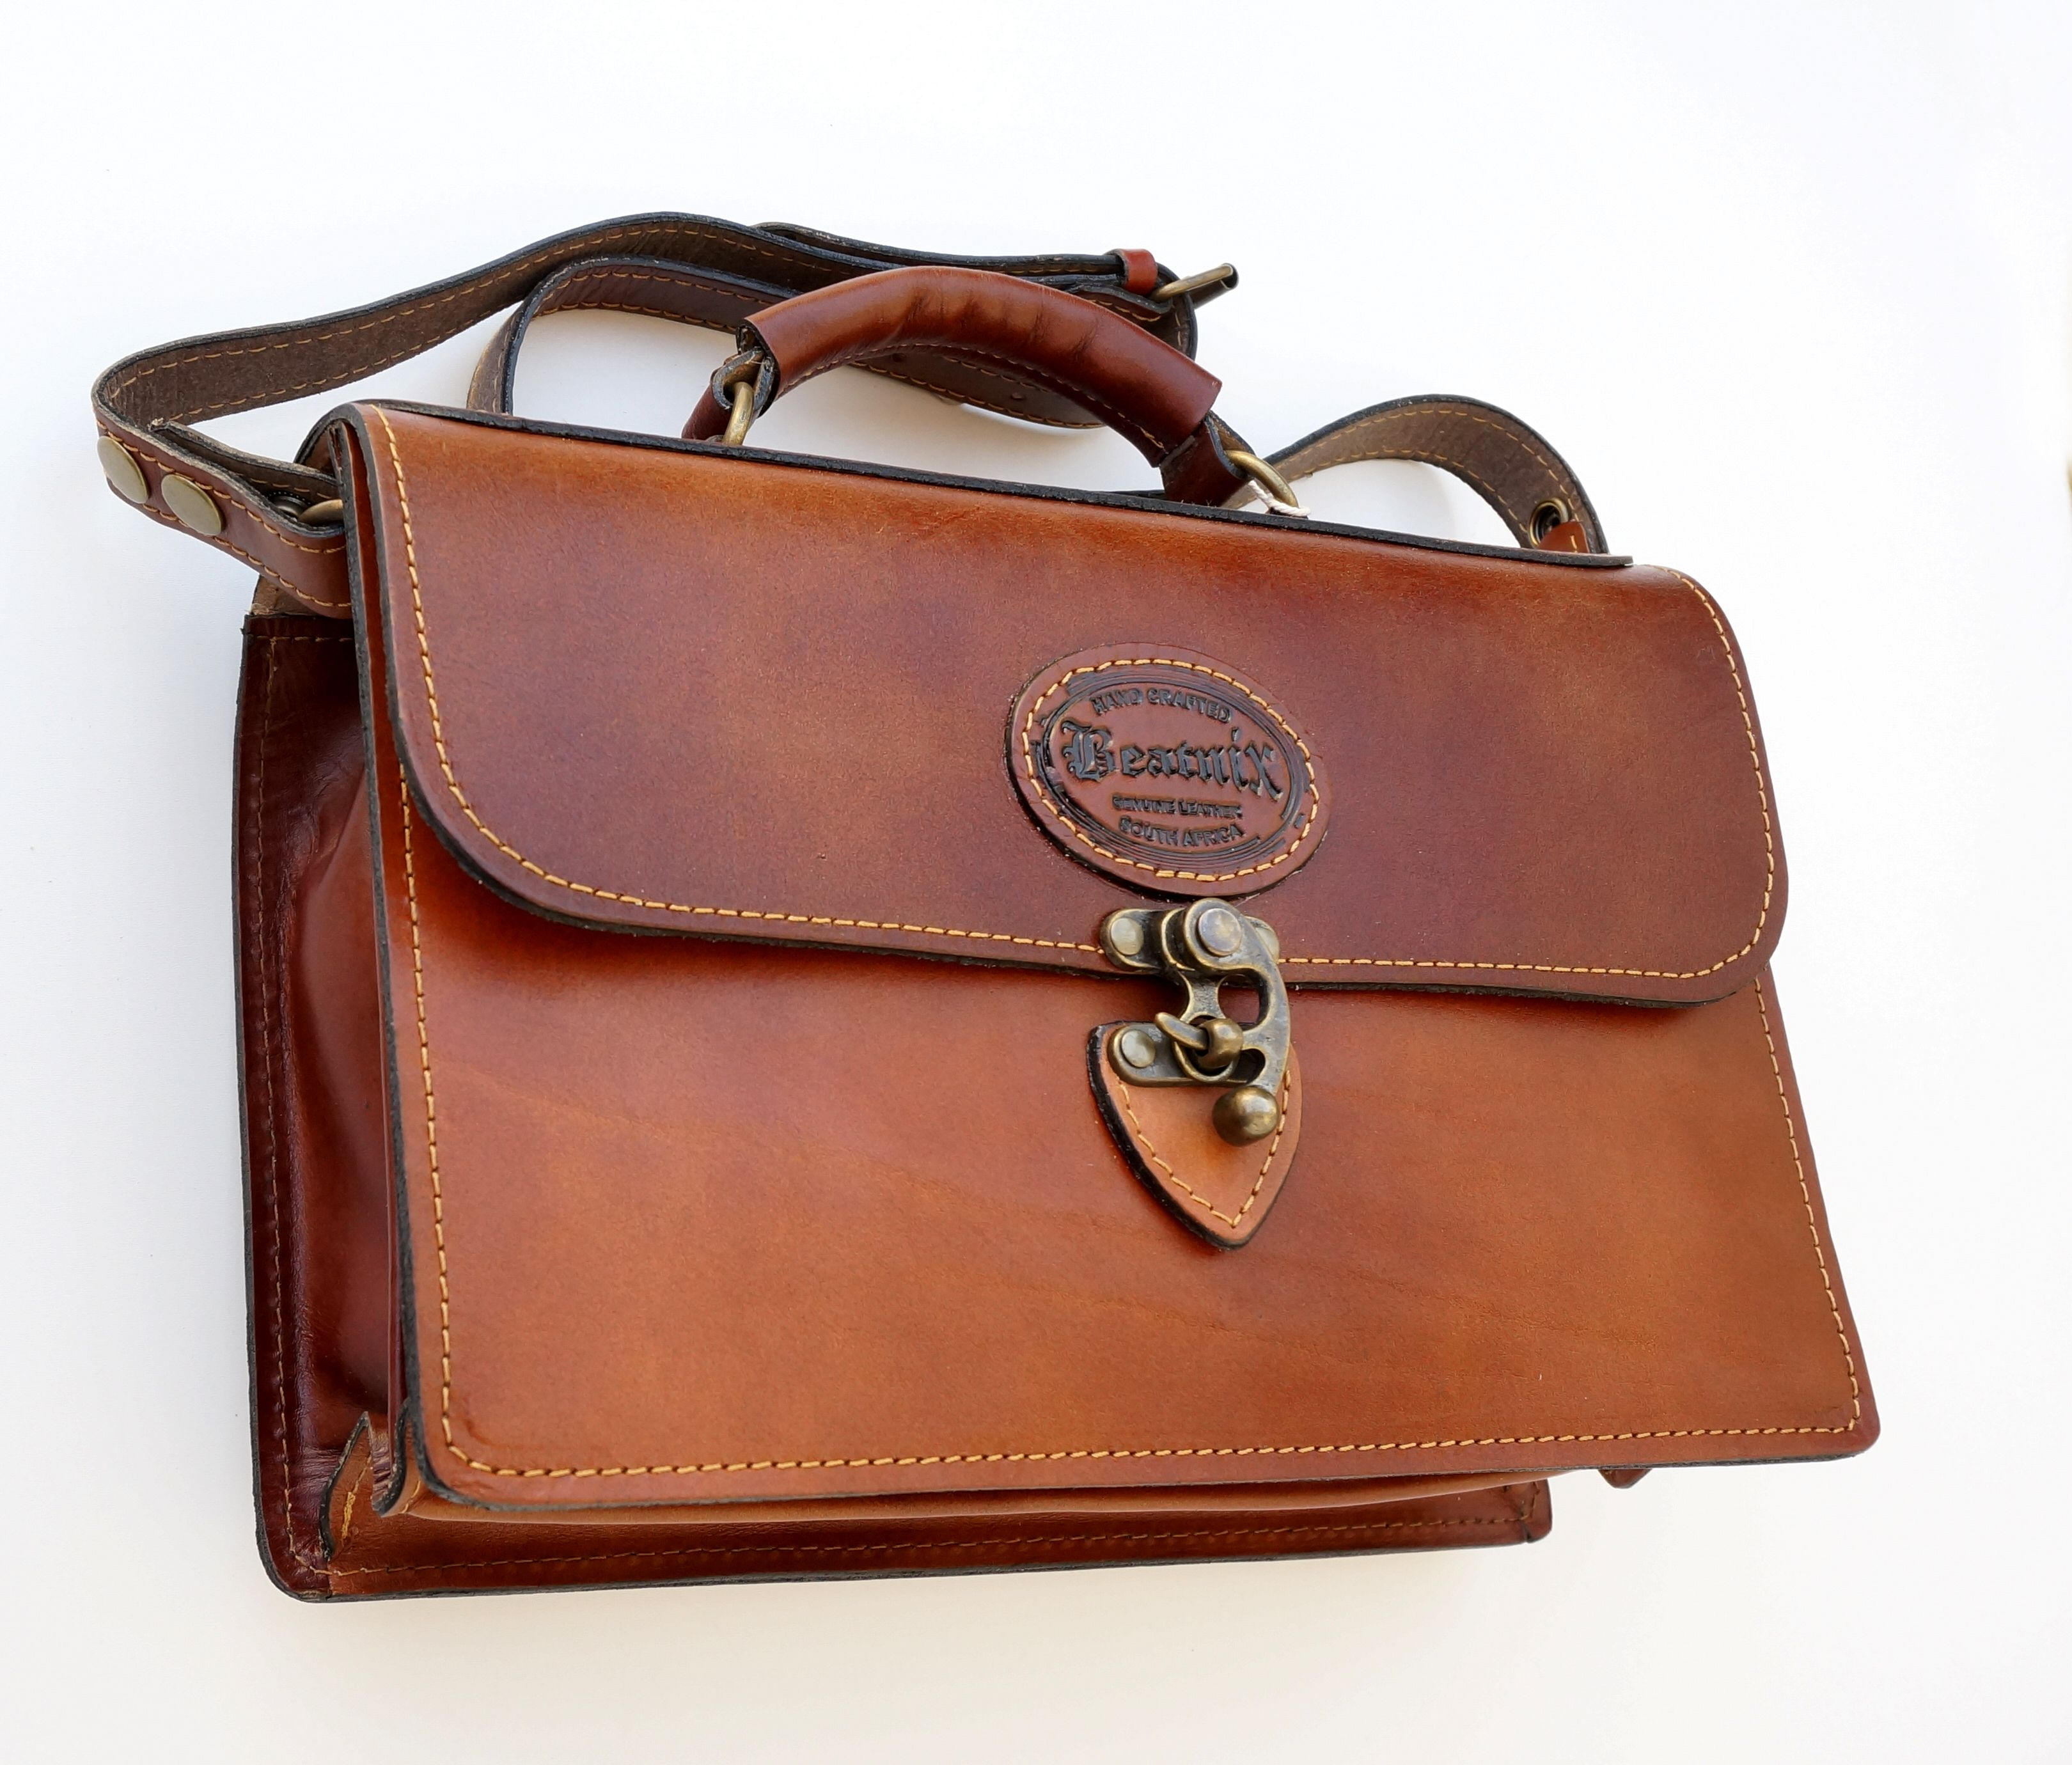 Beatnix Genuine Leather Handbag Handcrafted in South Africa ...